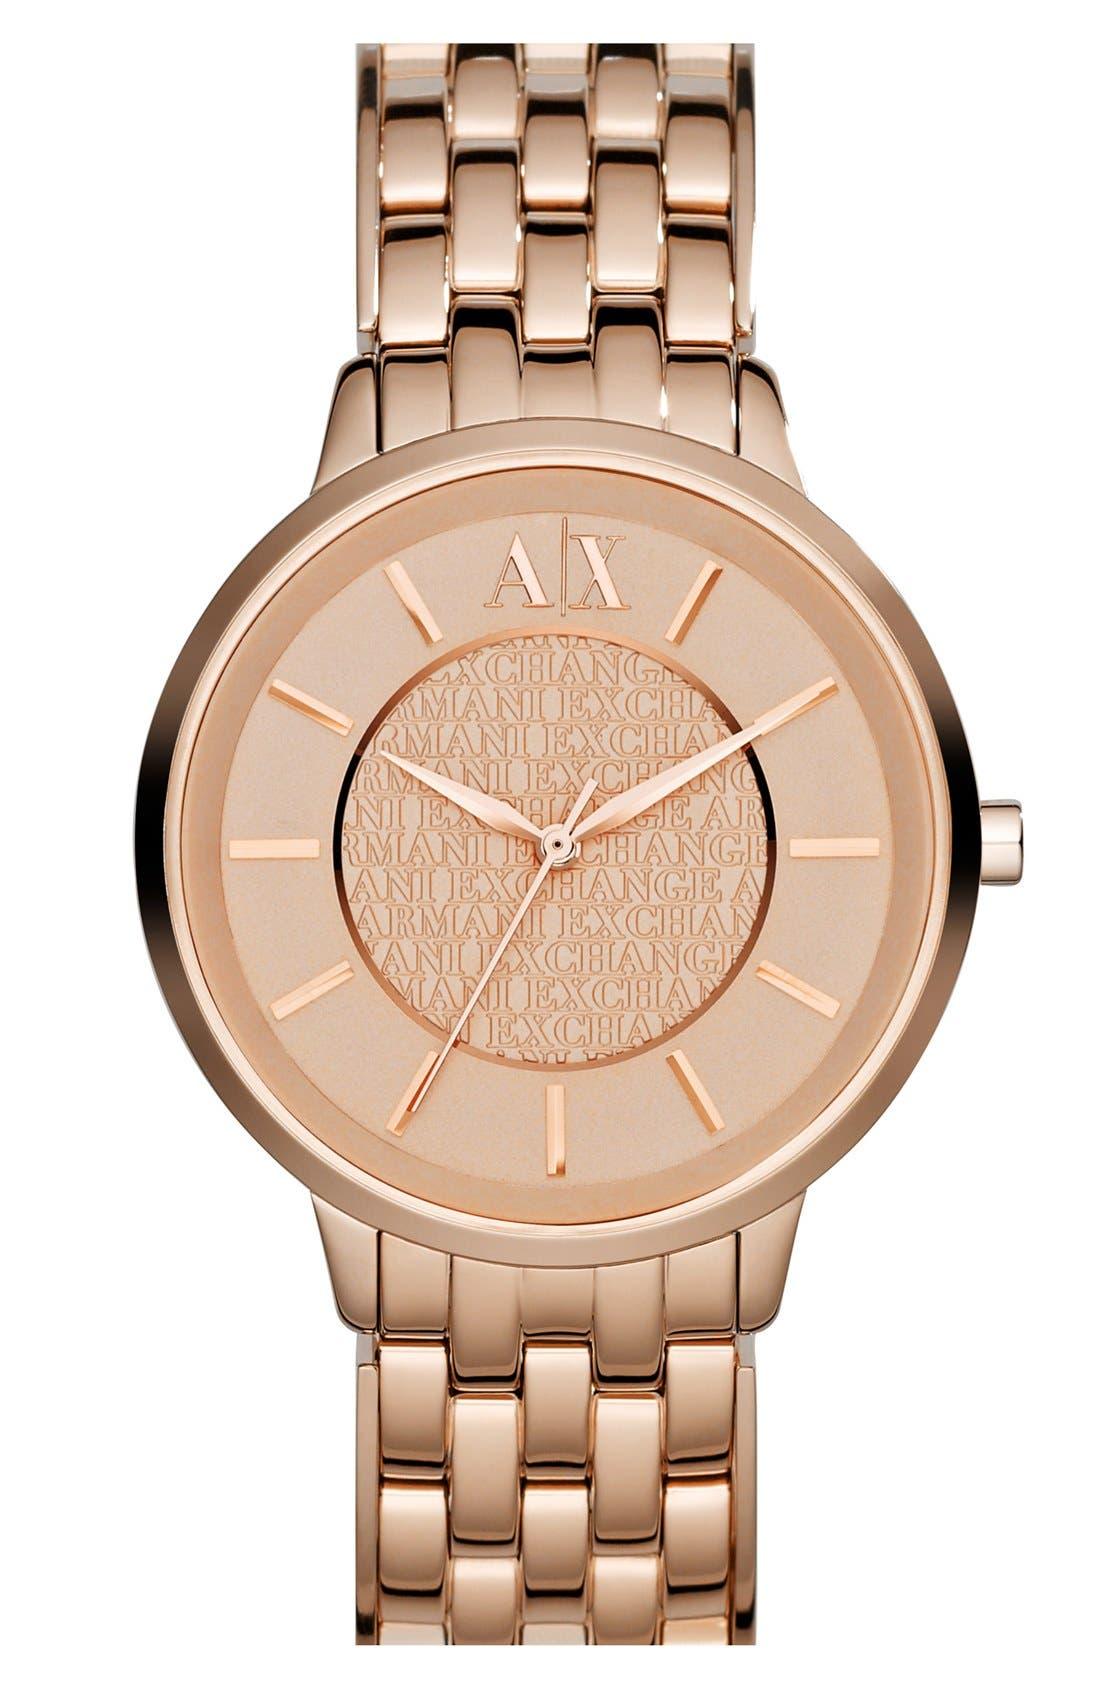 Main Image - AX Armani Exchange Round Bracelet Watch, 38mm